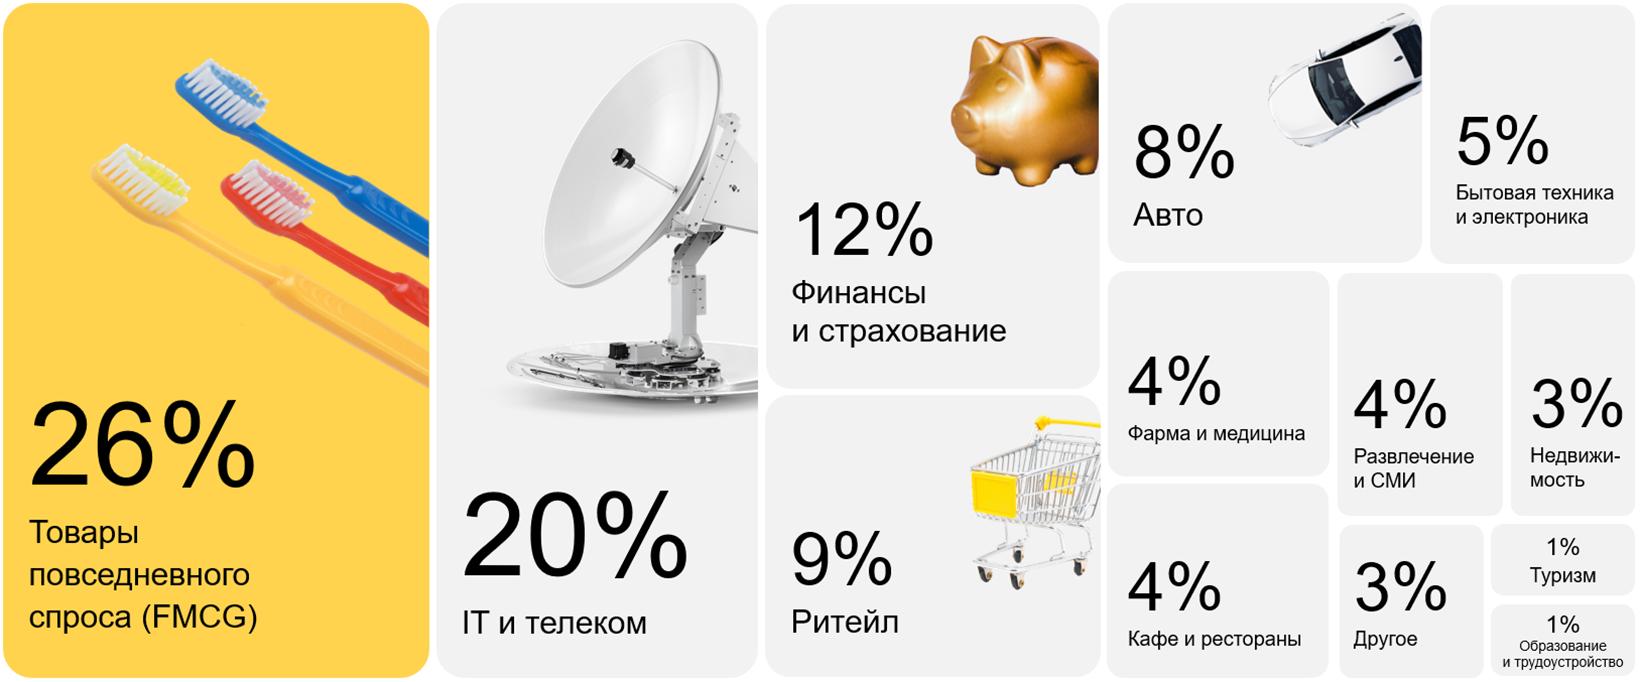 В Видеосети «Яндекса» спрос на рекламу вырос на 69%